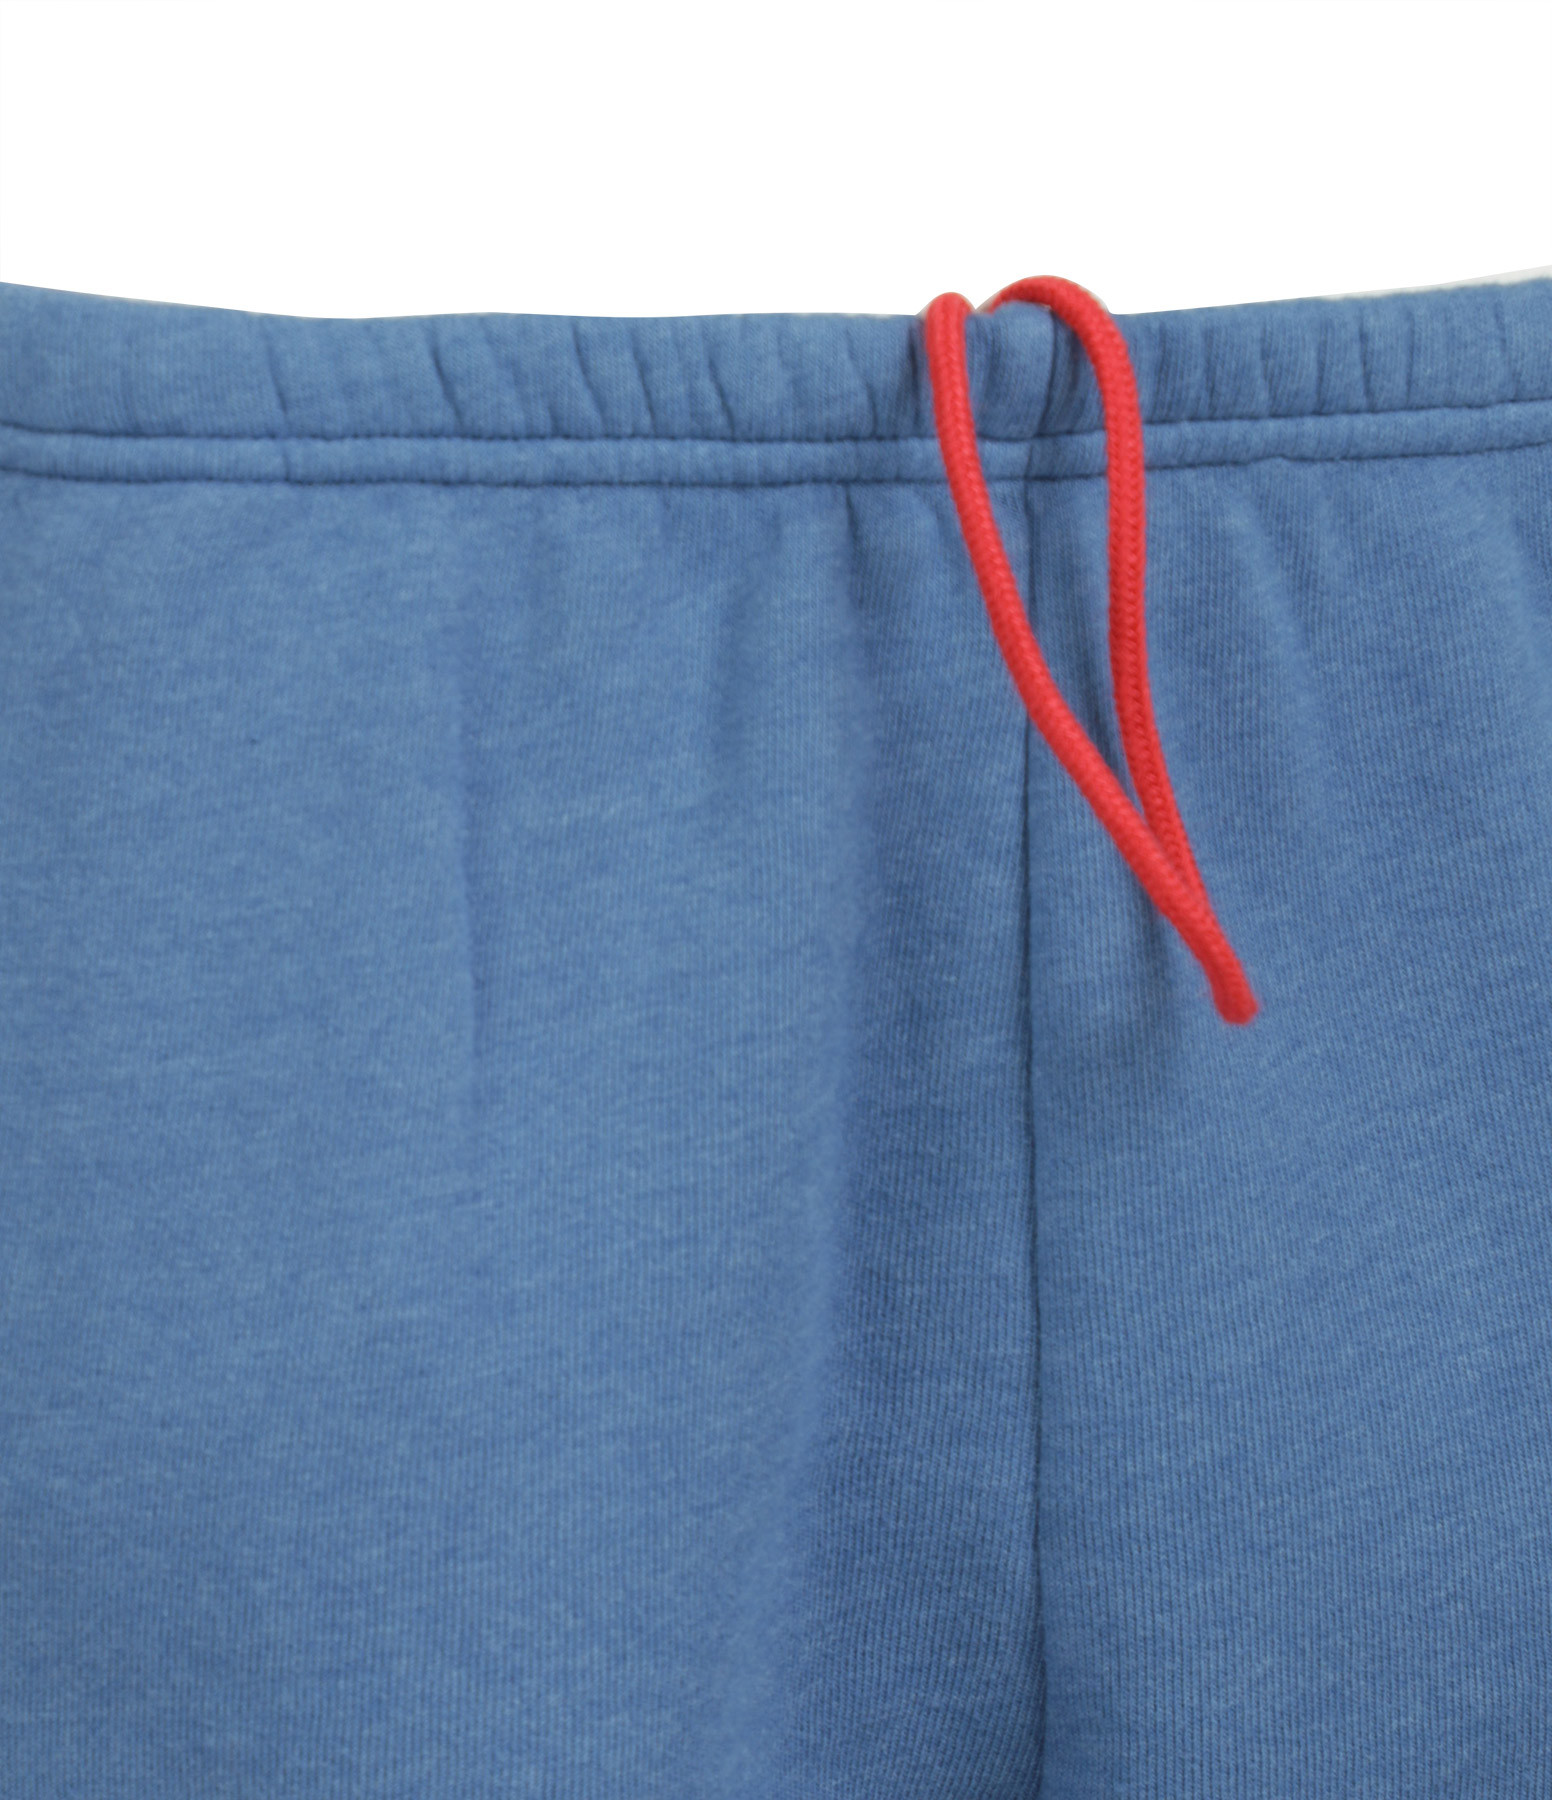 XIRENA - Jogging Crosby Coton Bleu Océan